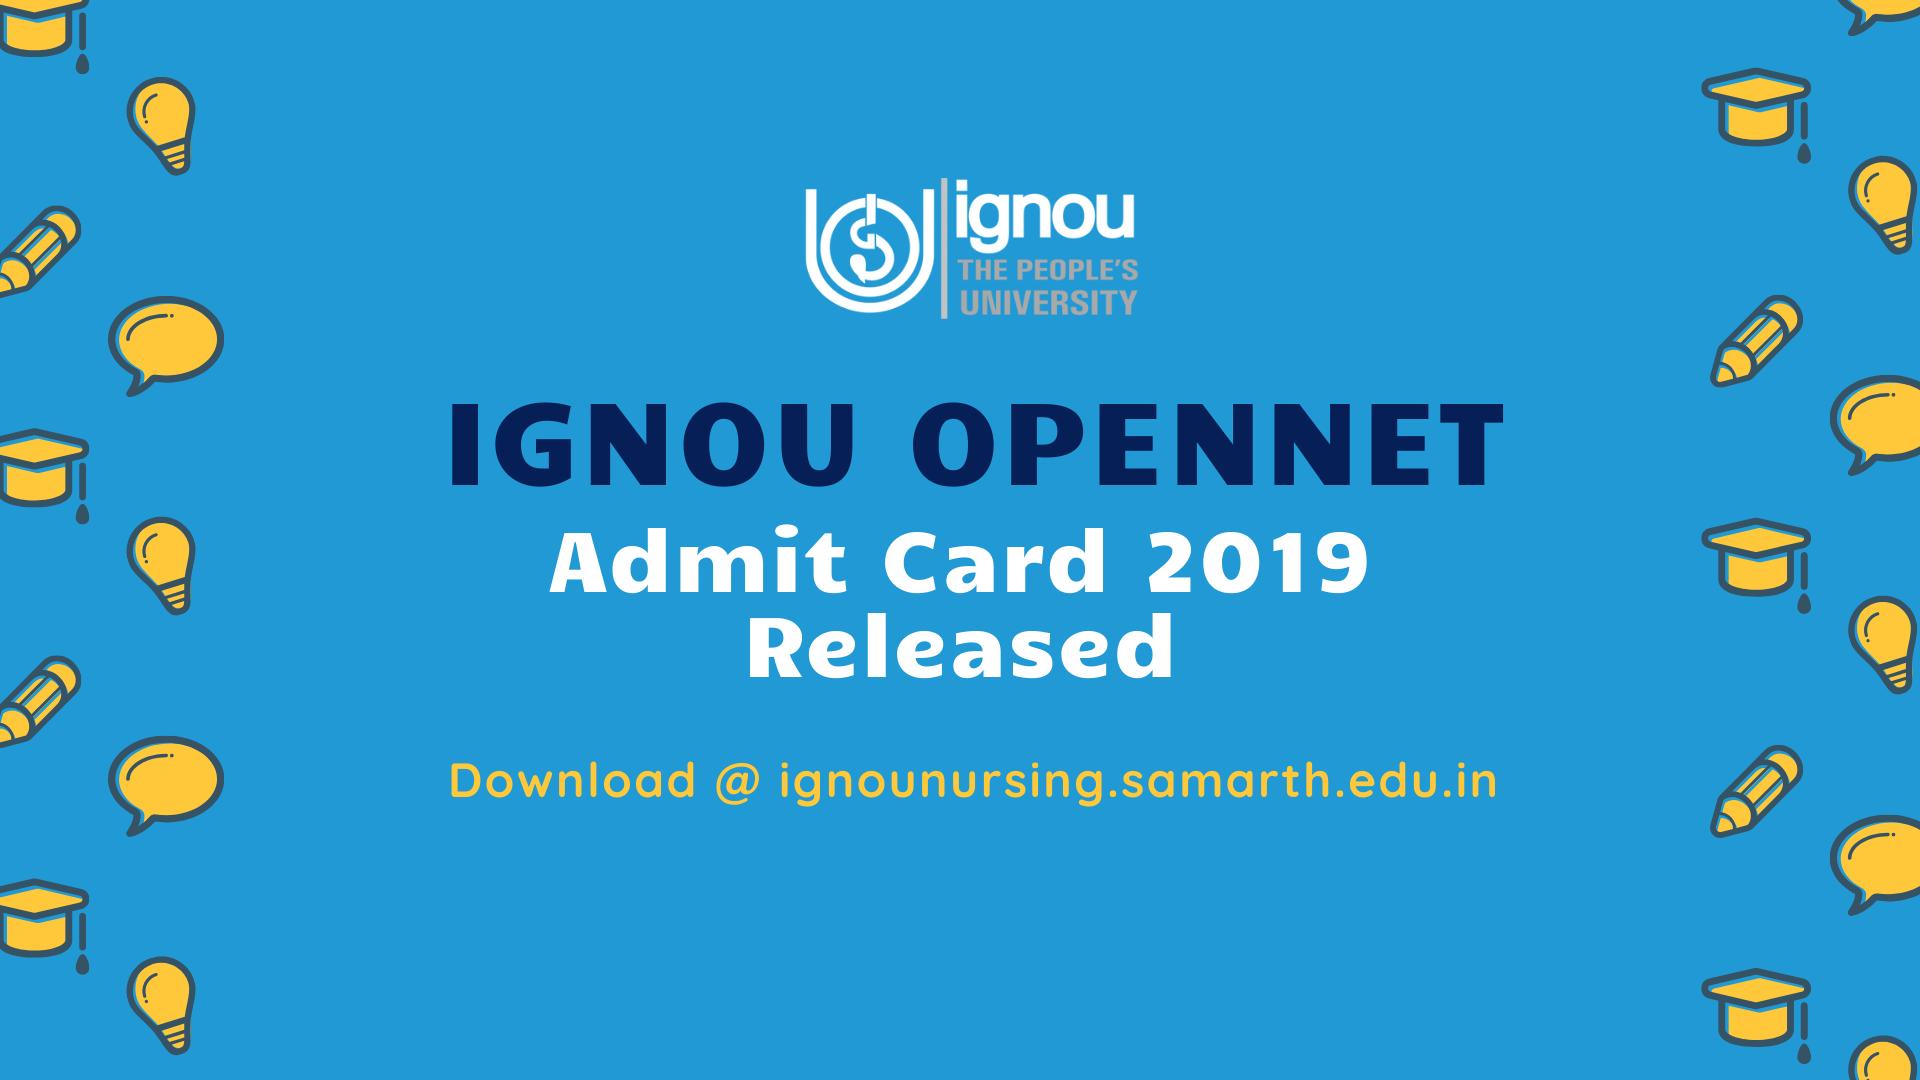 IGNOU OPENNET Admit Card 2019 Released   Download At ignounursing.samarth.edu.in